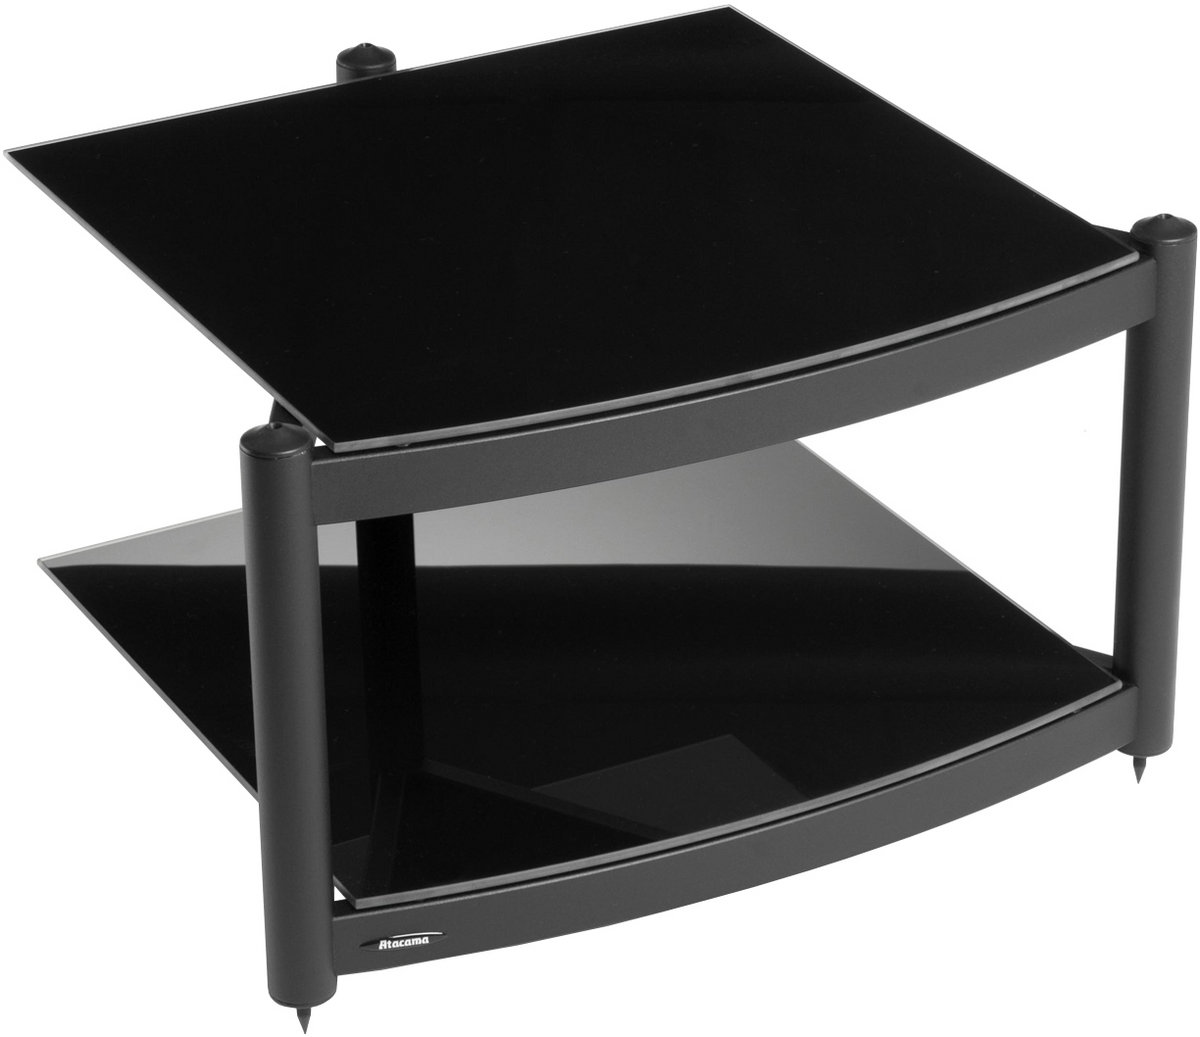 Atacama equinox 2 hifi meubles hi fi son vid for Meuble tv triangulaire